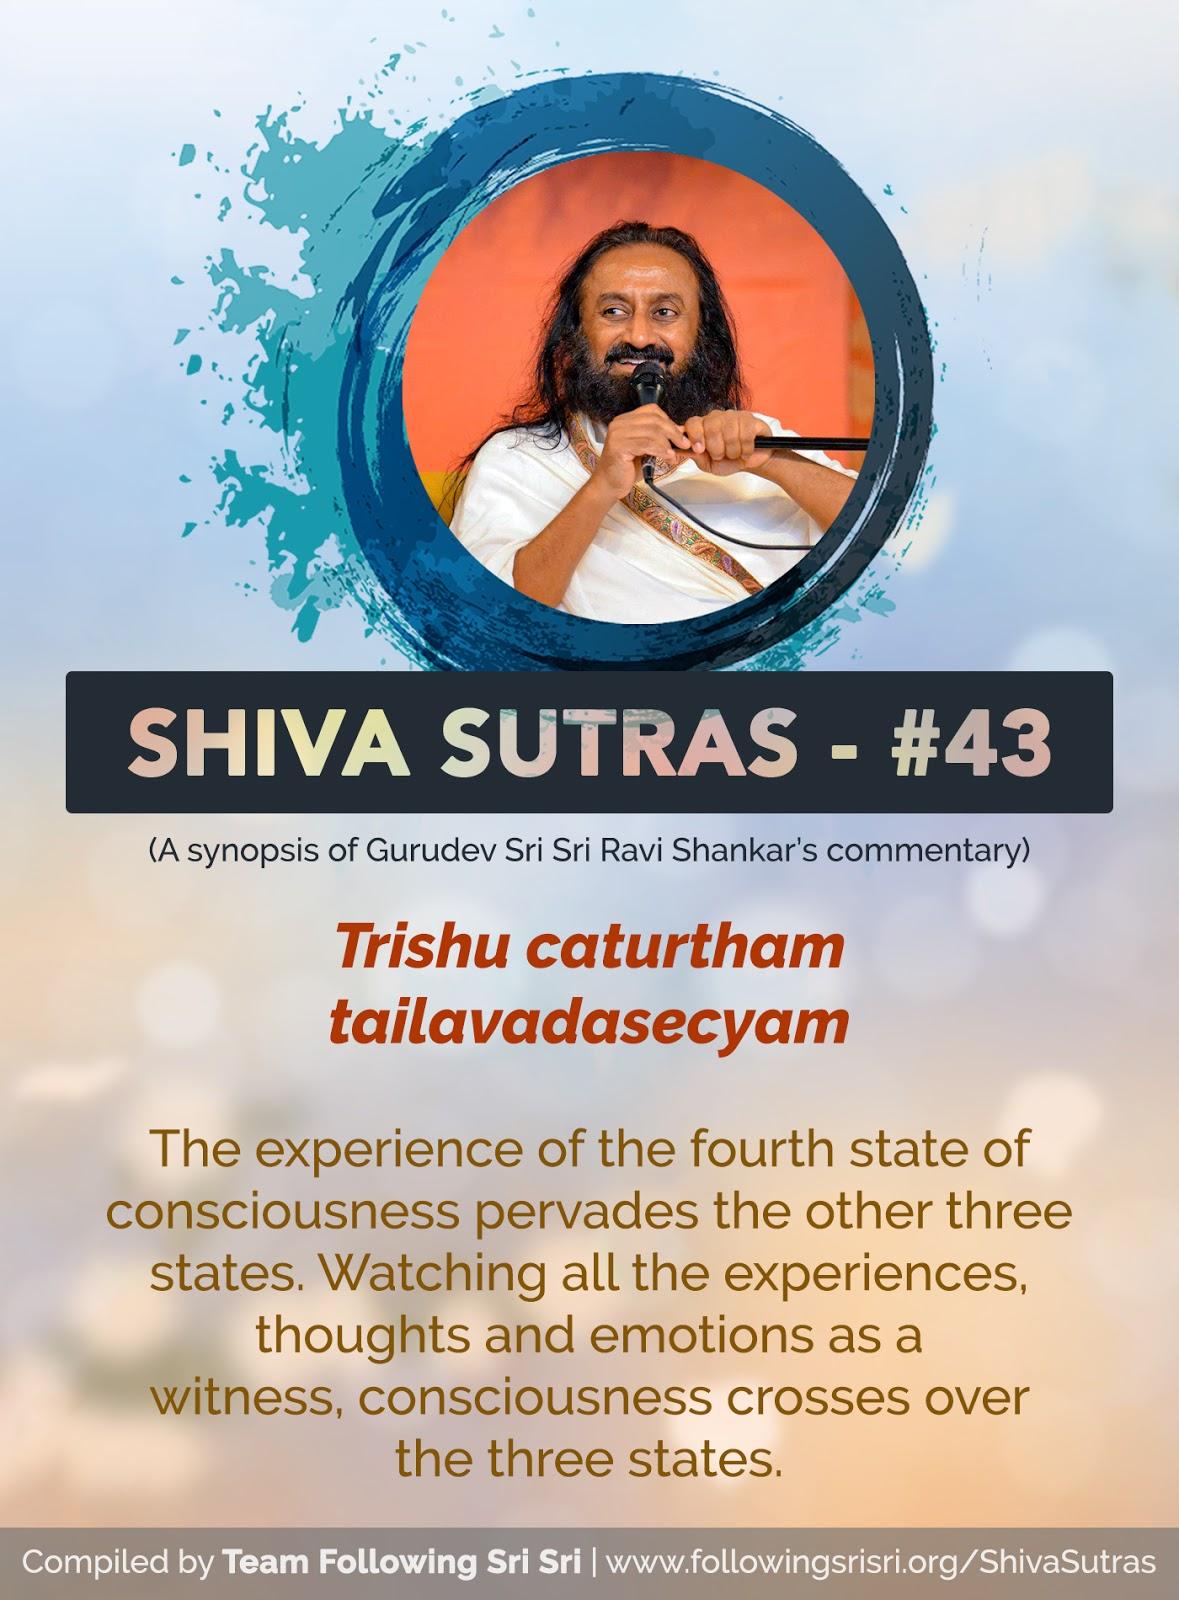 Shiva Sutras - Sutra 43